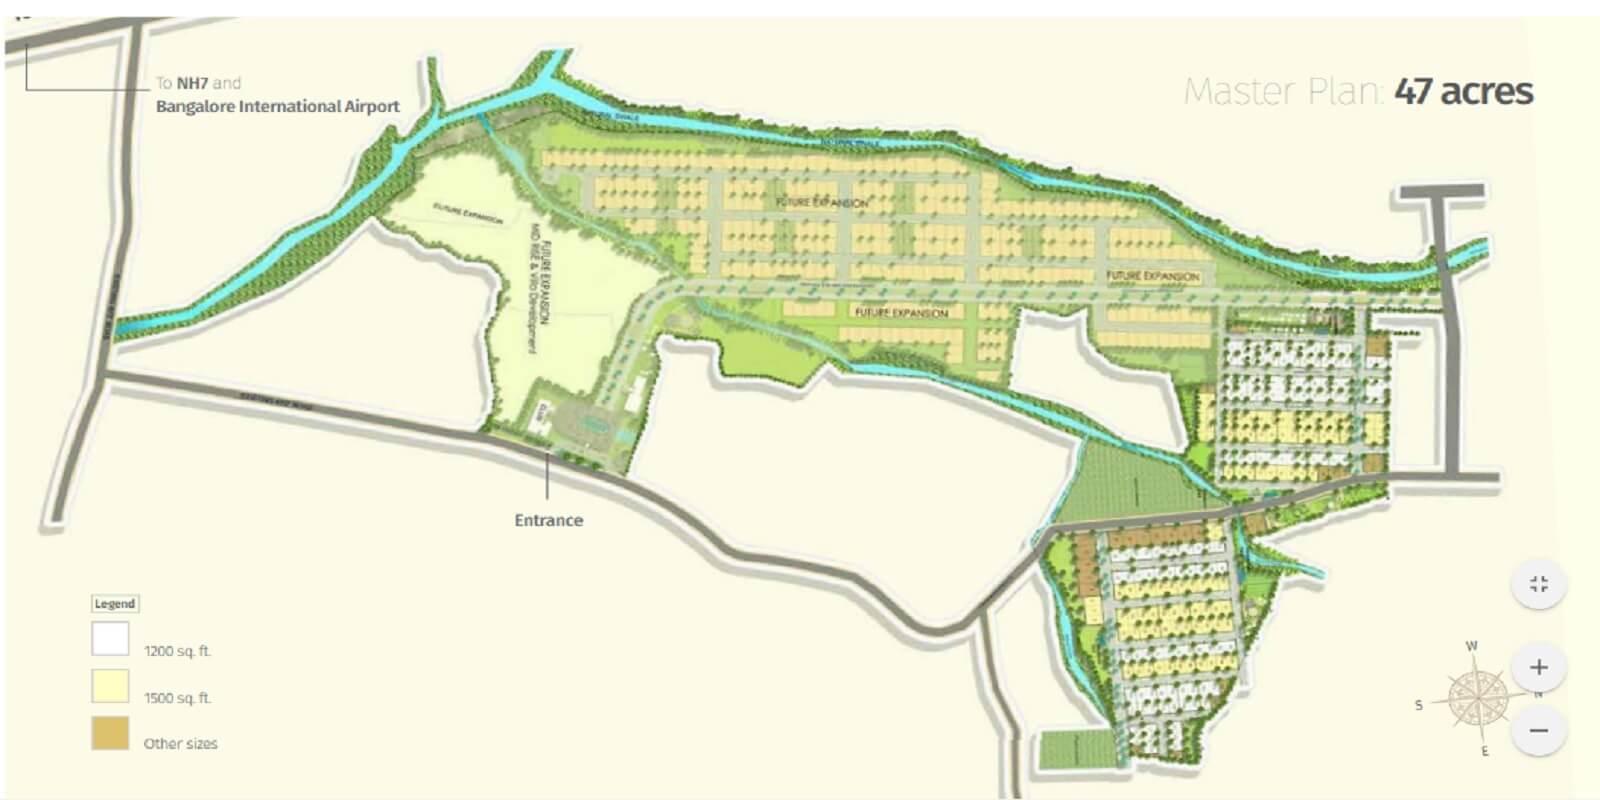 north gardens master plan image1